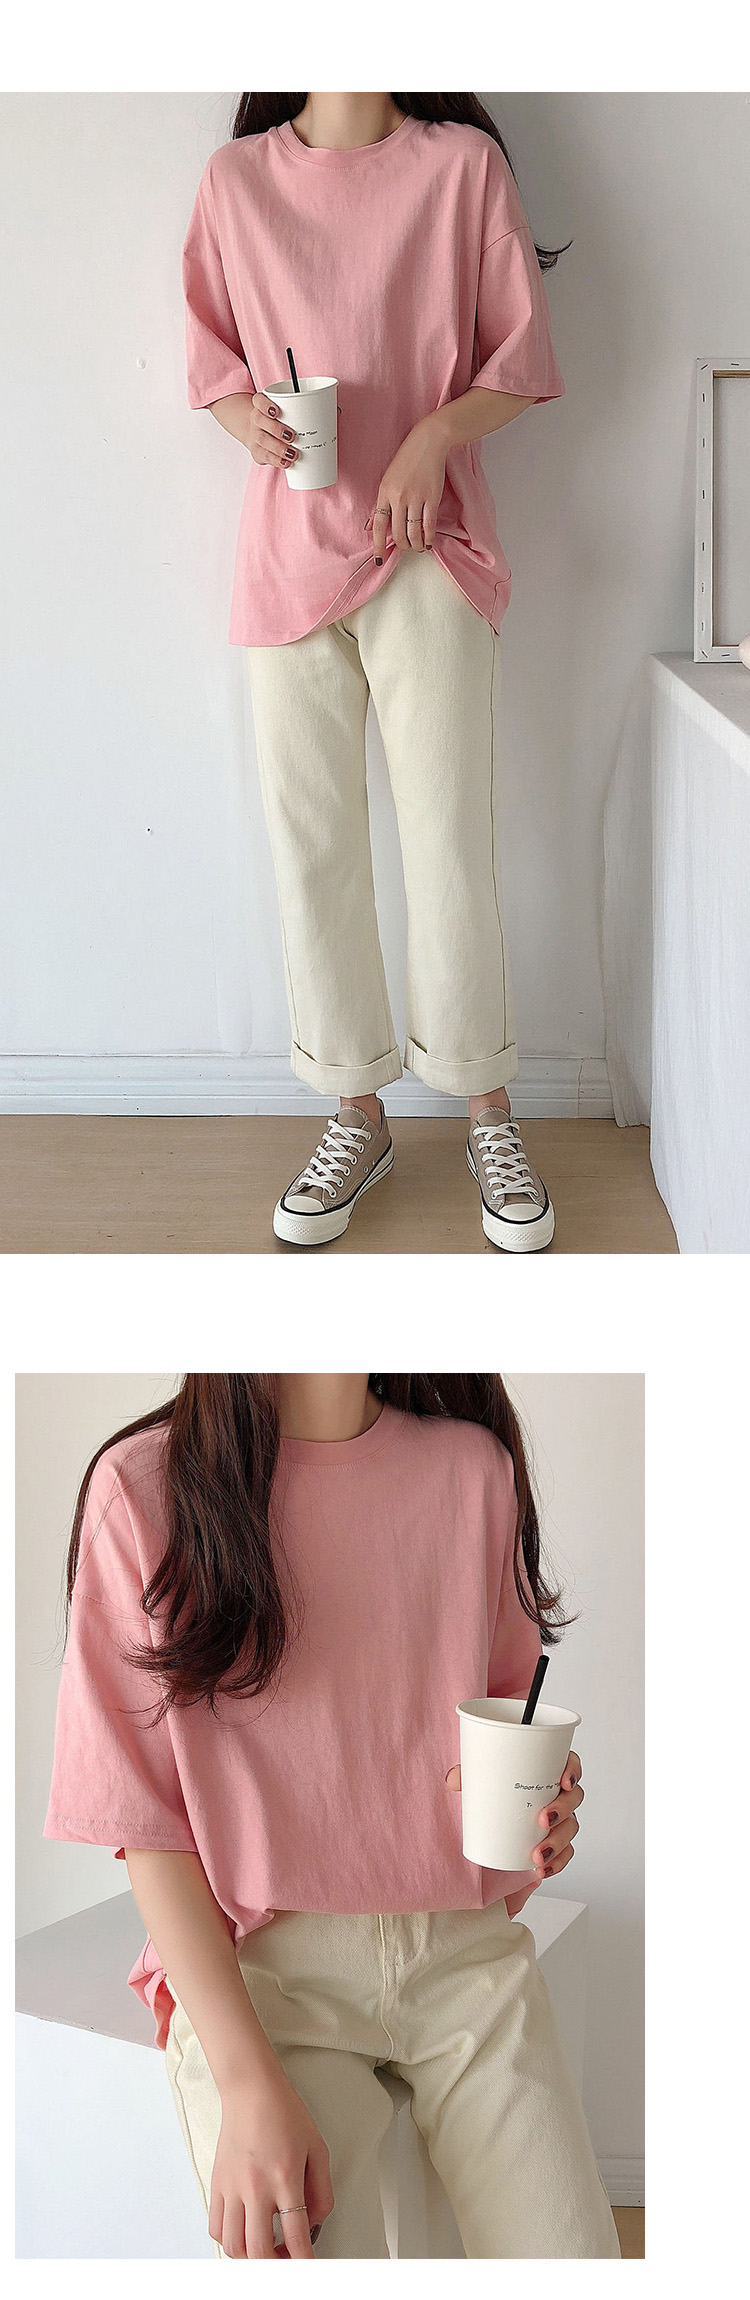 Ha0bd4128893e4f42b56ea90e02f7a116H - Summer O-Neck Short Sleeves Minimalist Loose Basic T-Shirt